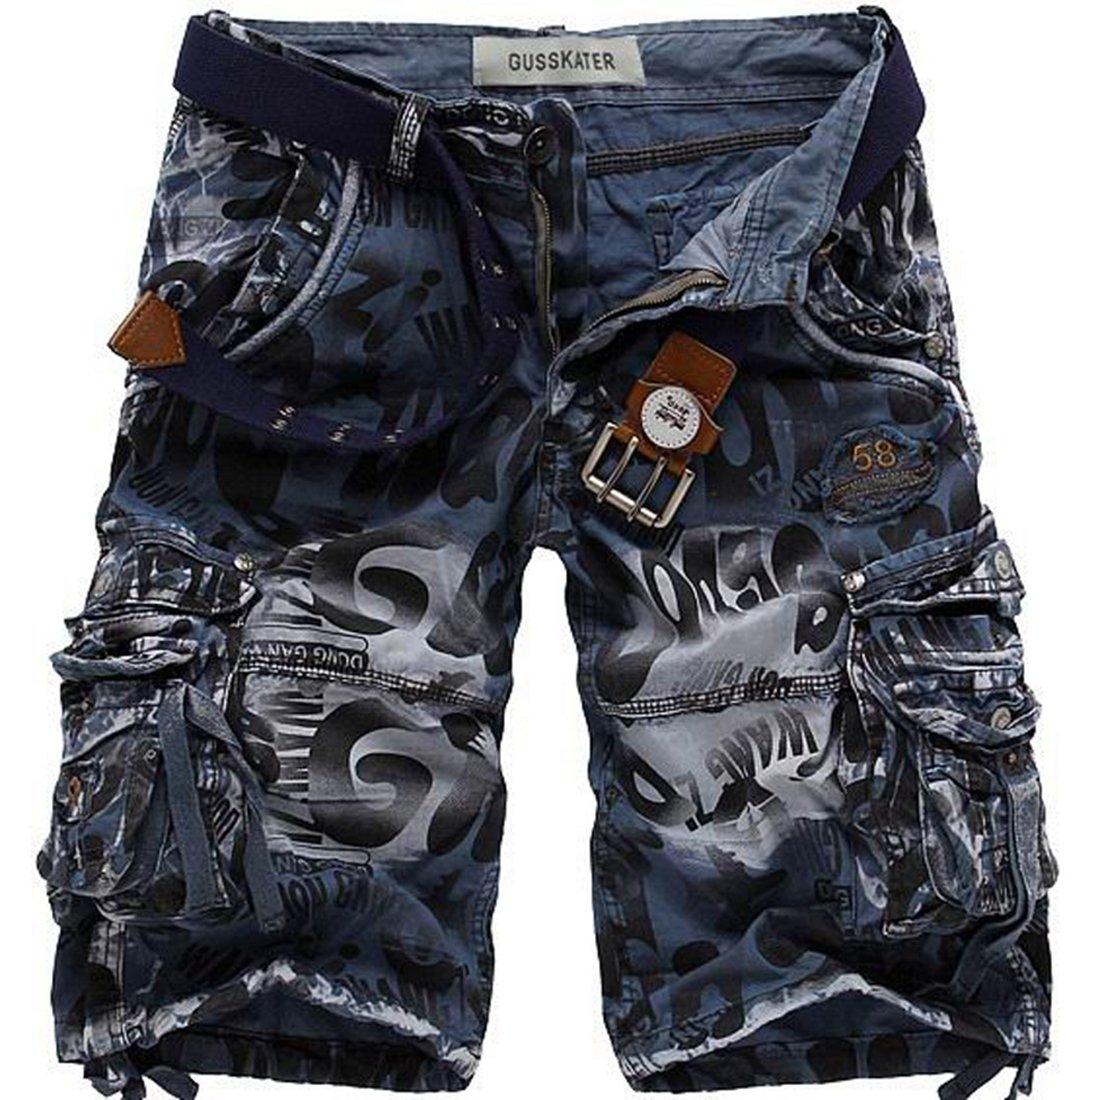 Men's Cotton Loose Fit Multi Pocket Cargo Shorts(No Belt) 31)